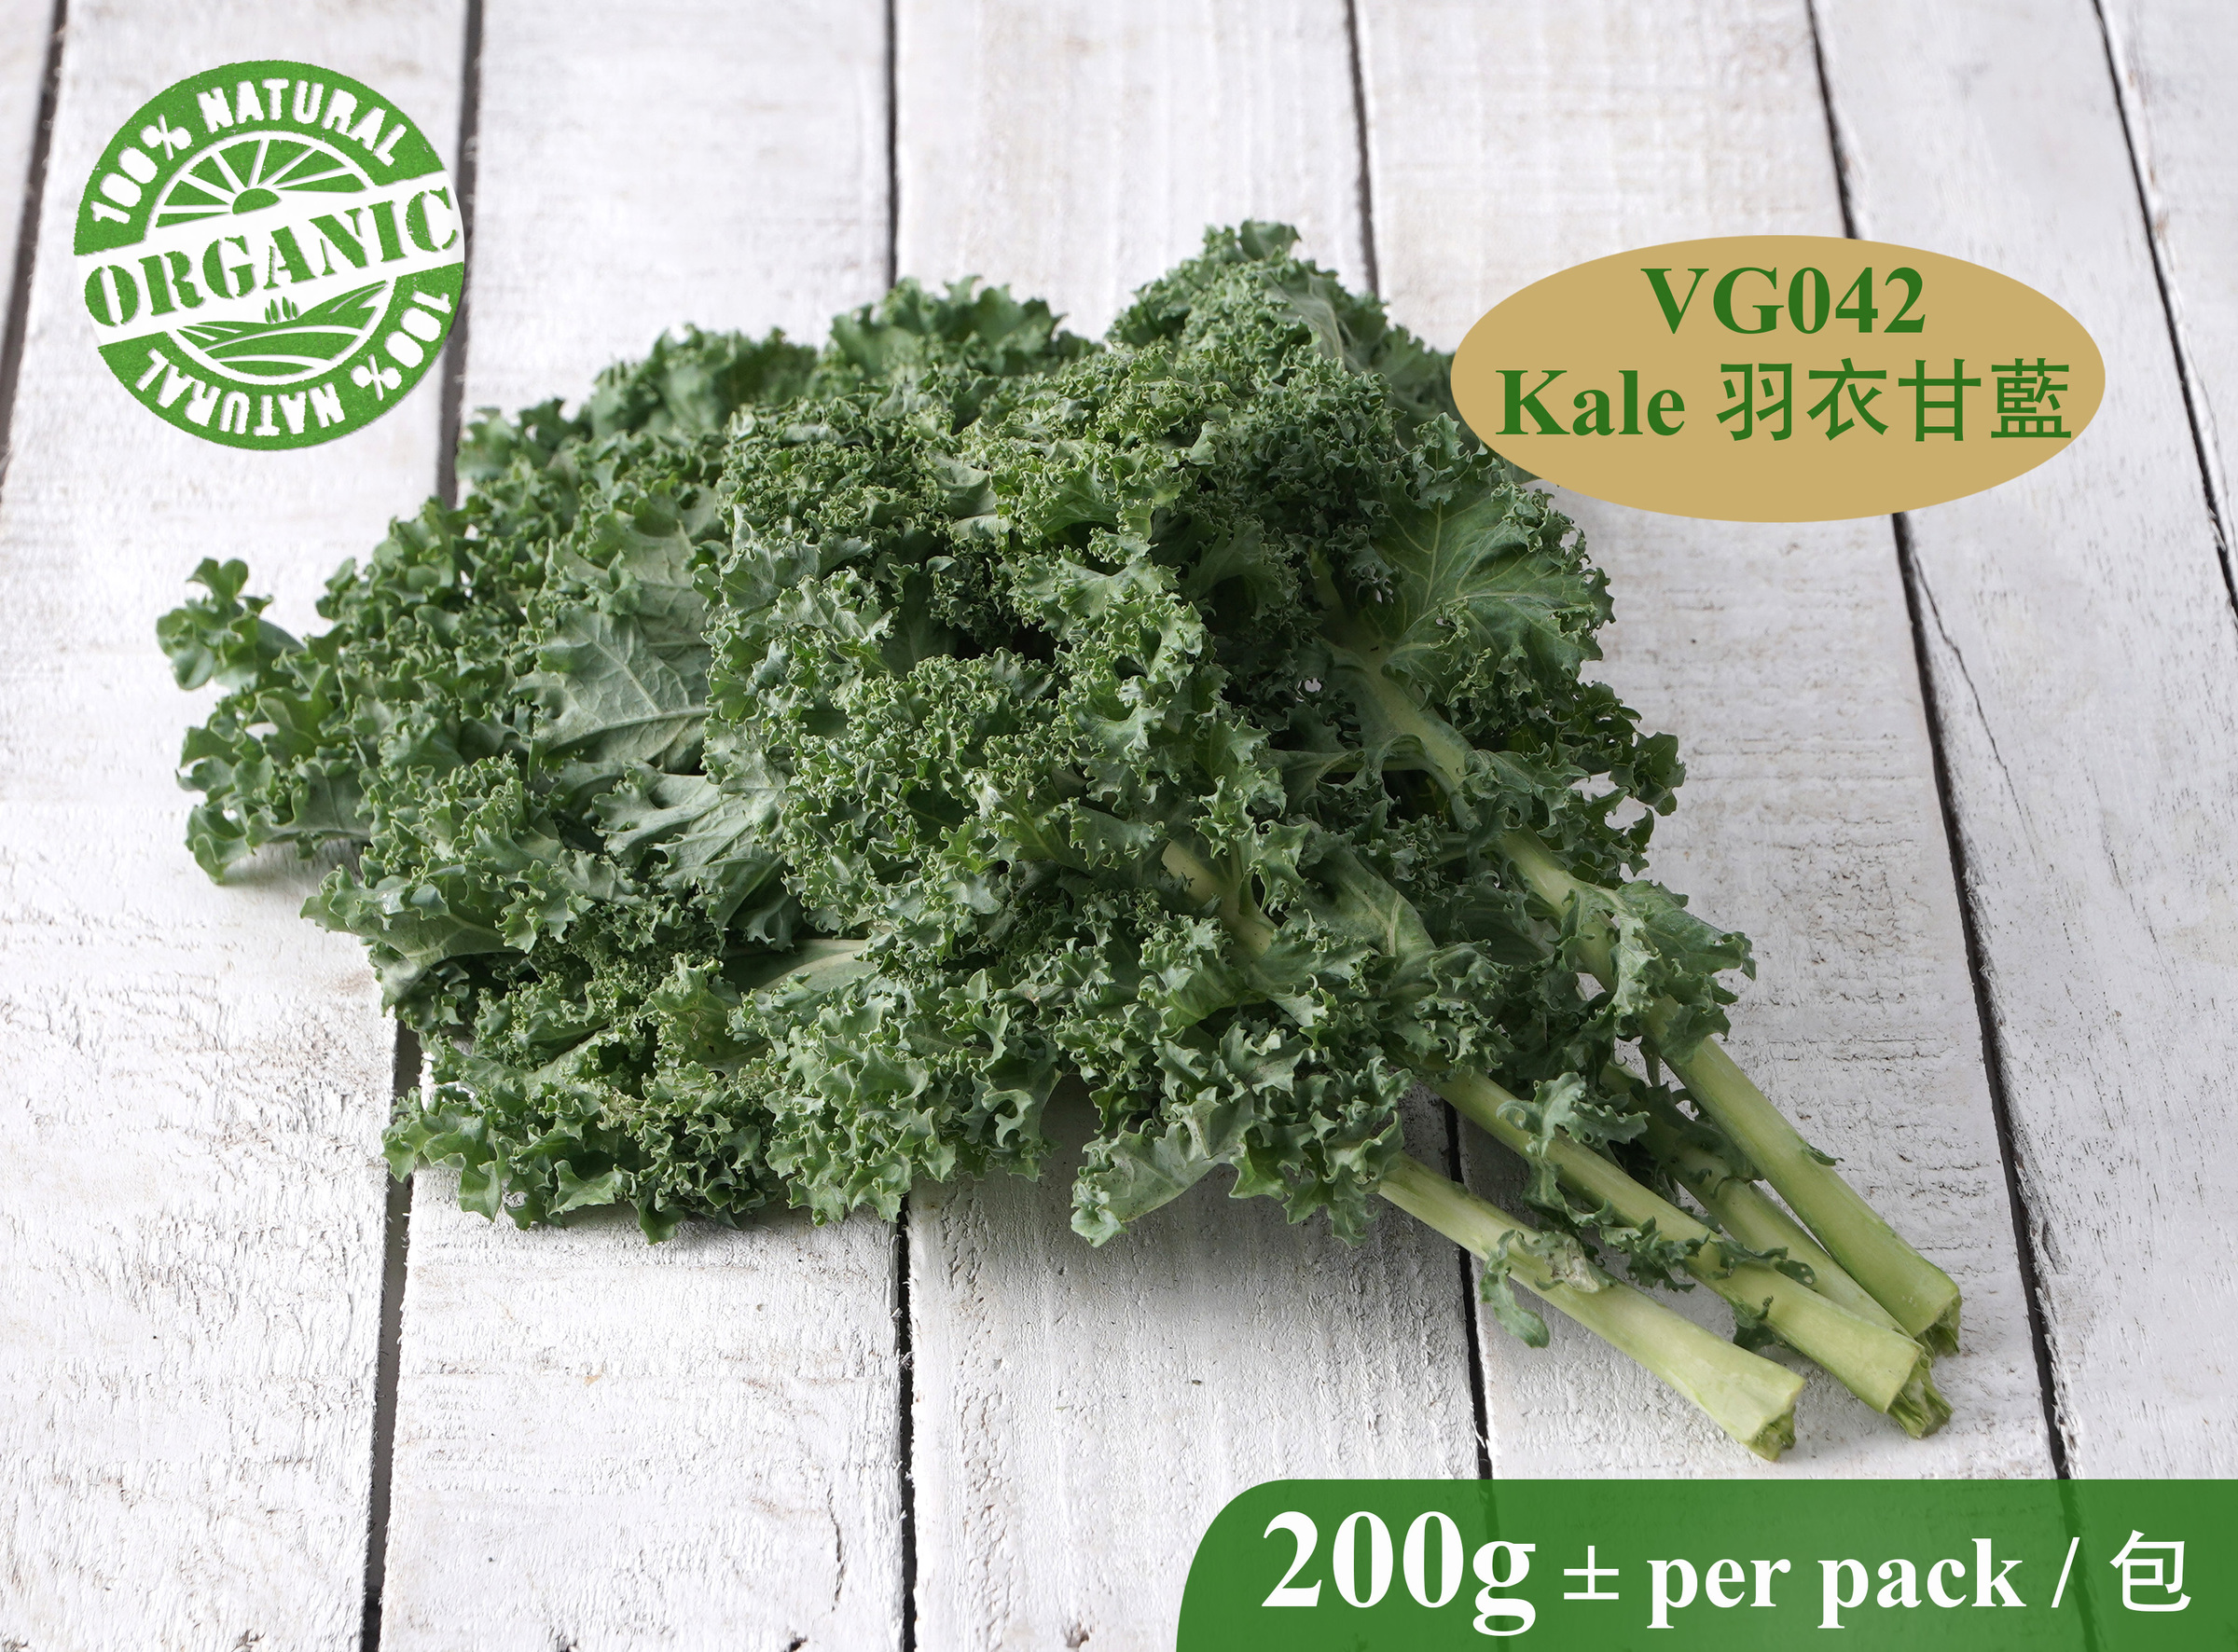 VG042 Kale-RM5.50 per 200g+.jpg